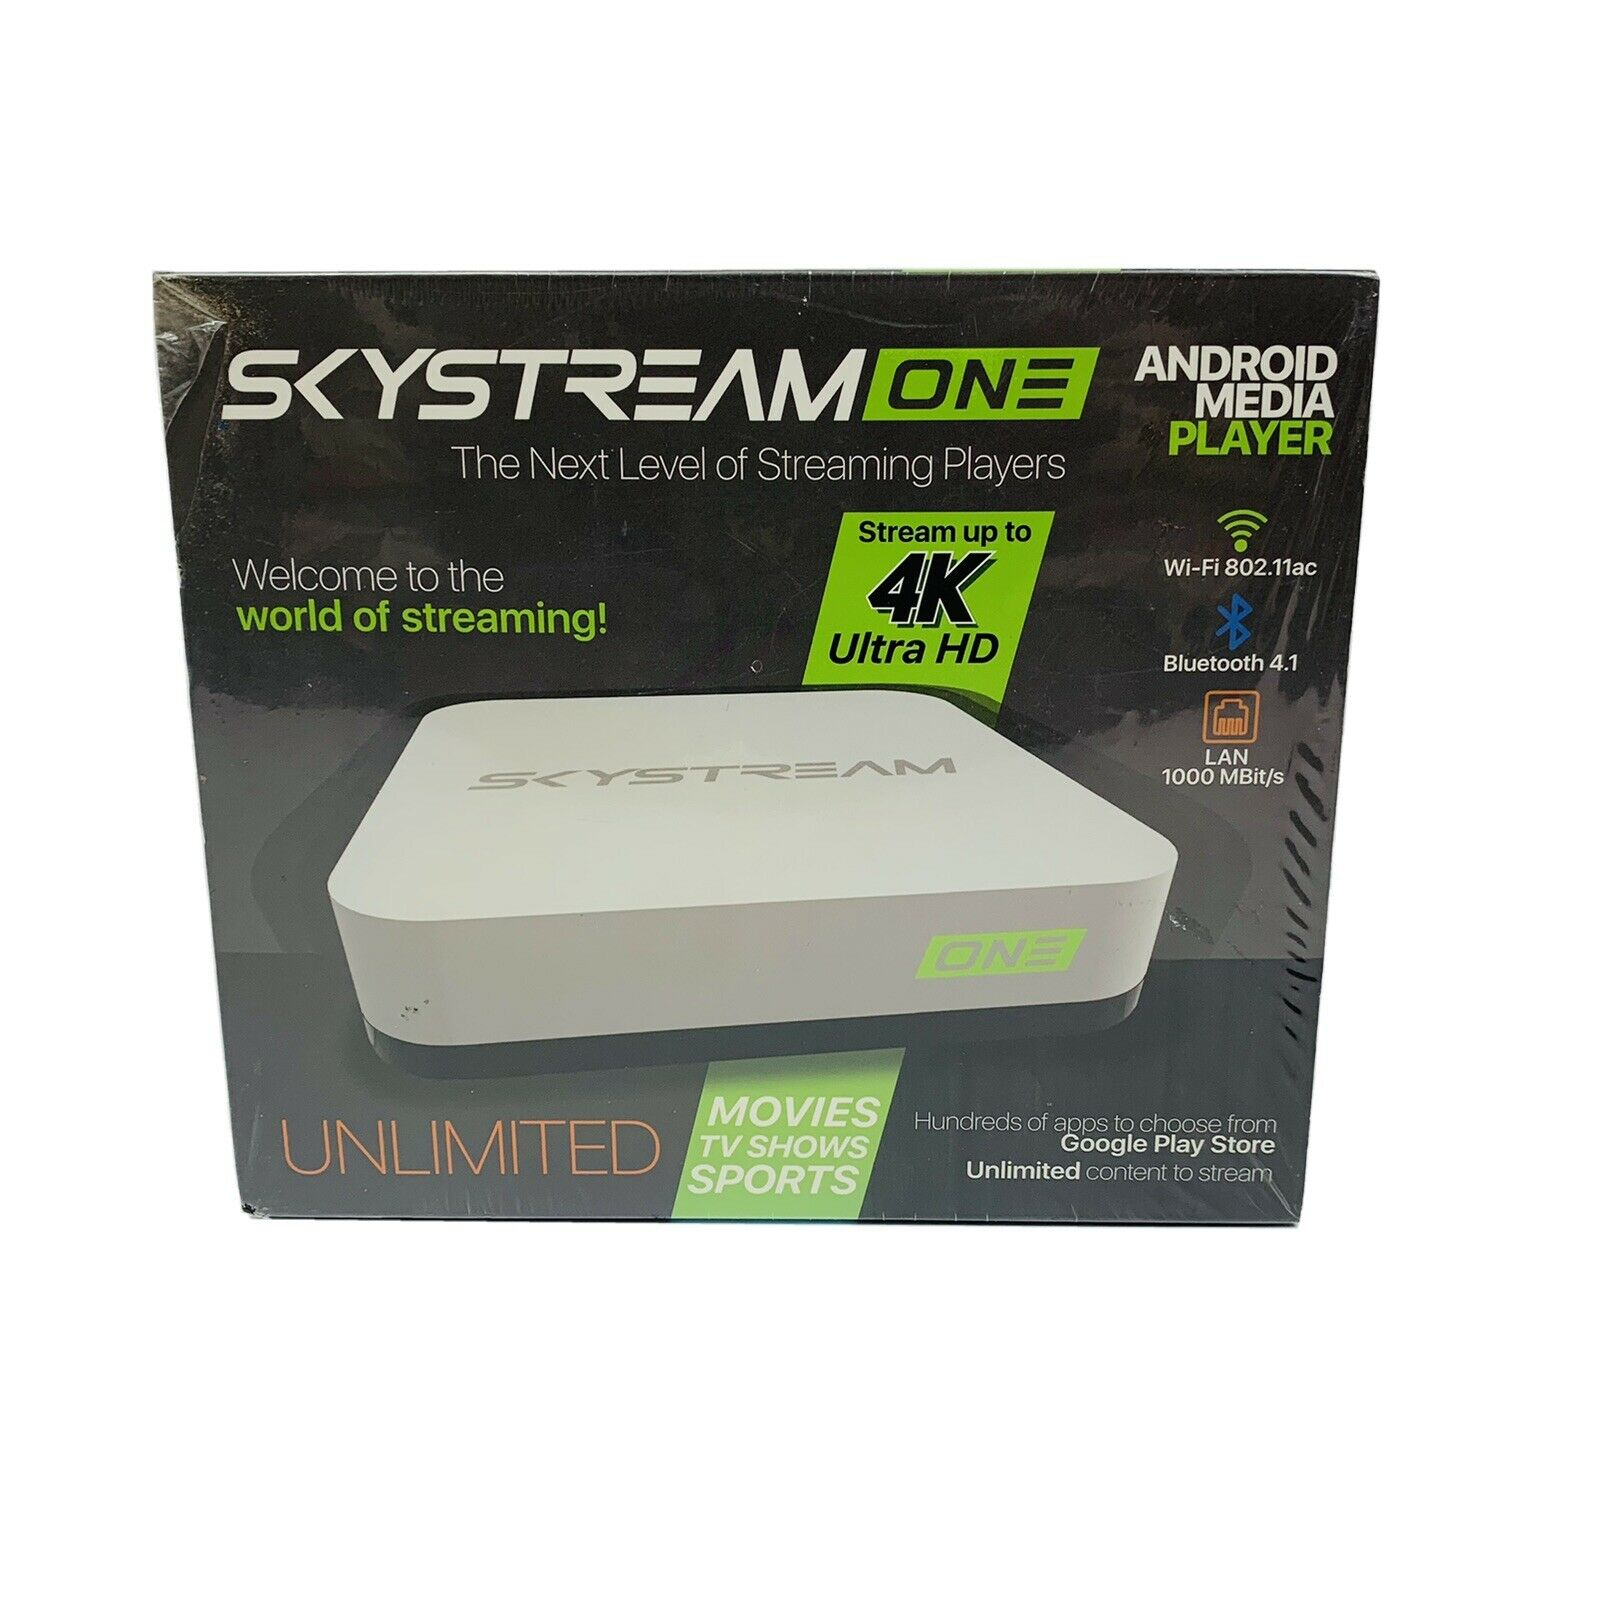 SkyStream ONE Streaming Media Player White media one player skystream streaming white